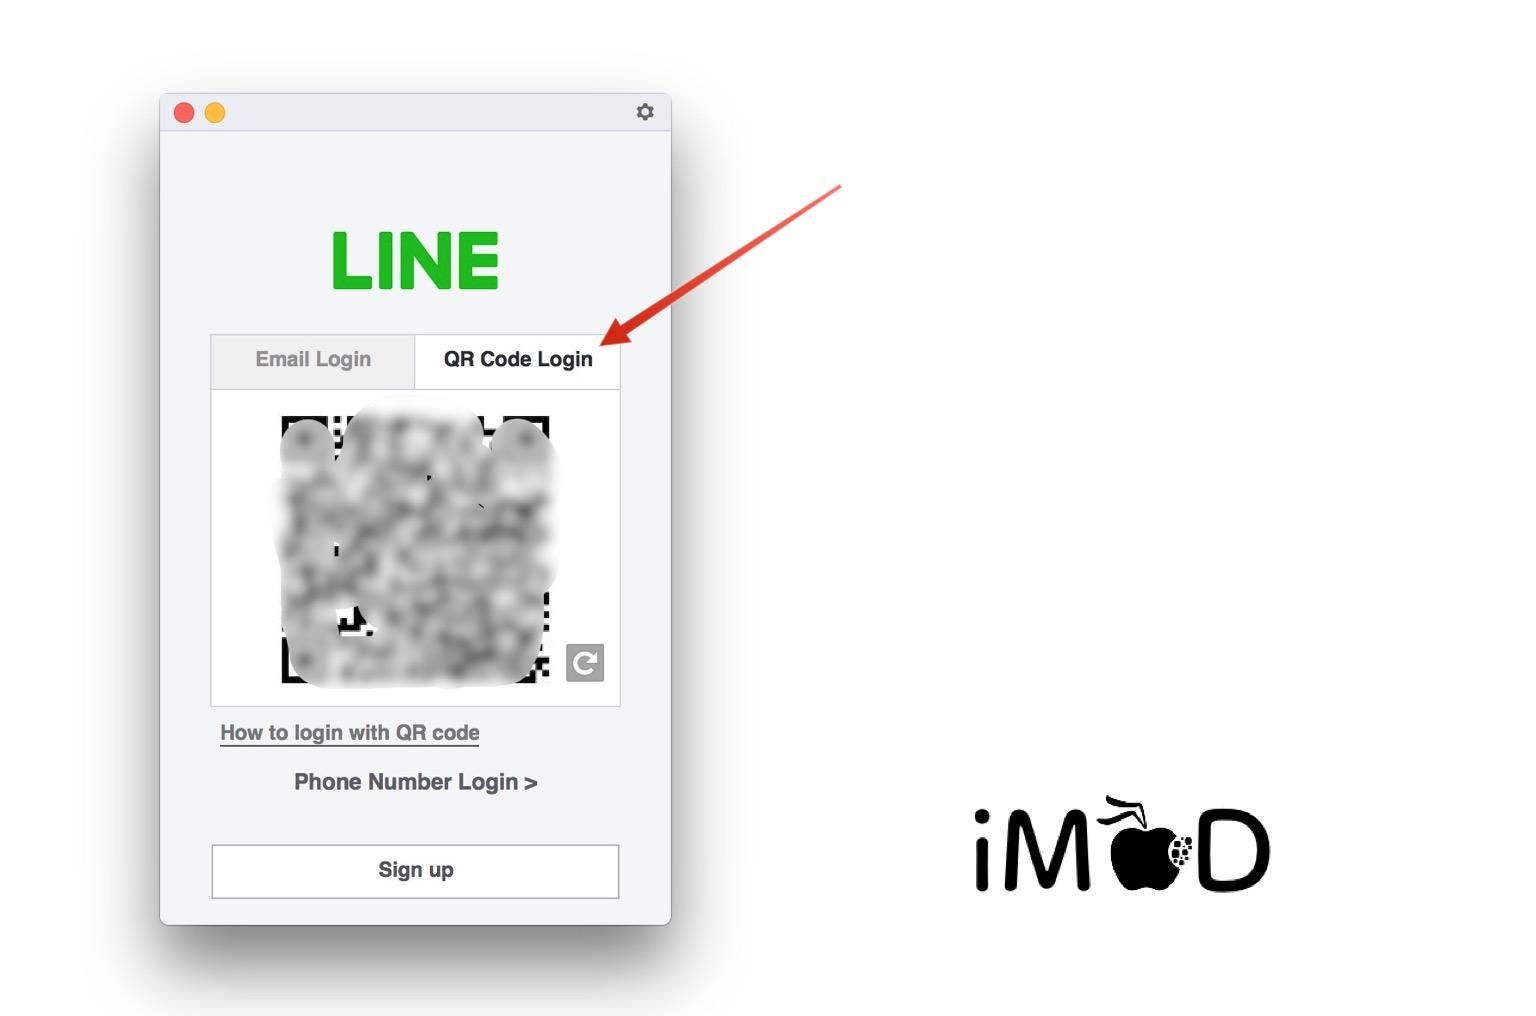 line-qr-code-login